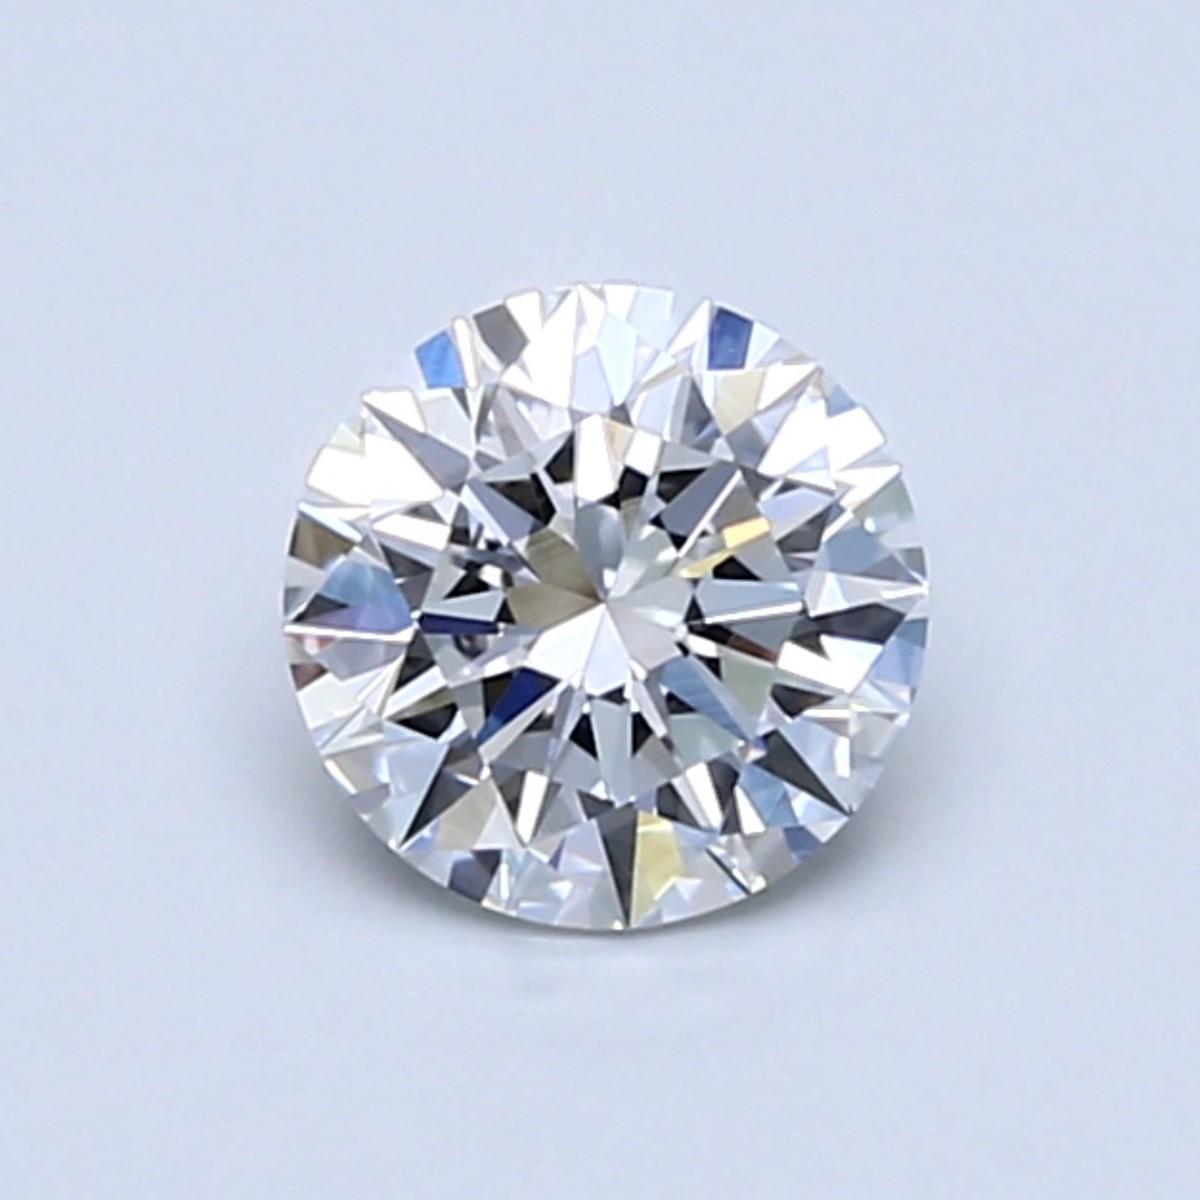 Blue Nile 0.71克拉 圆形钻石(切工EX,成色D,净度VVS2)